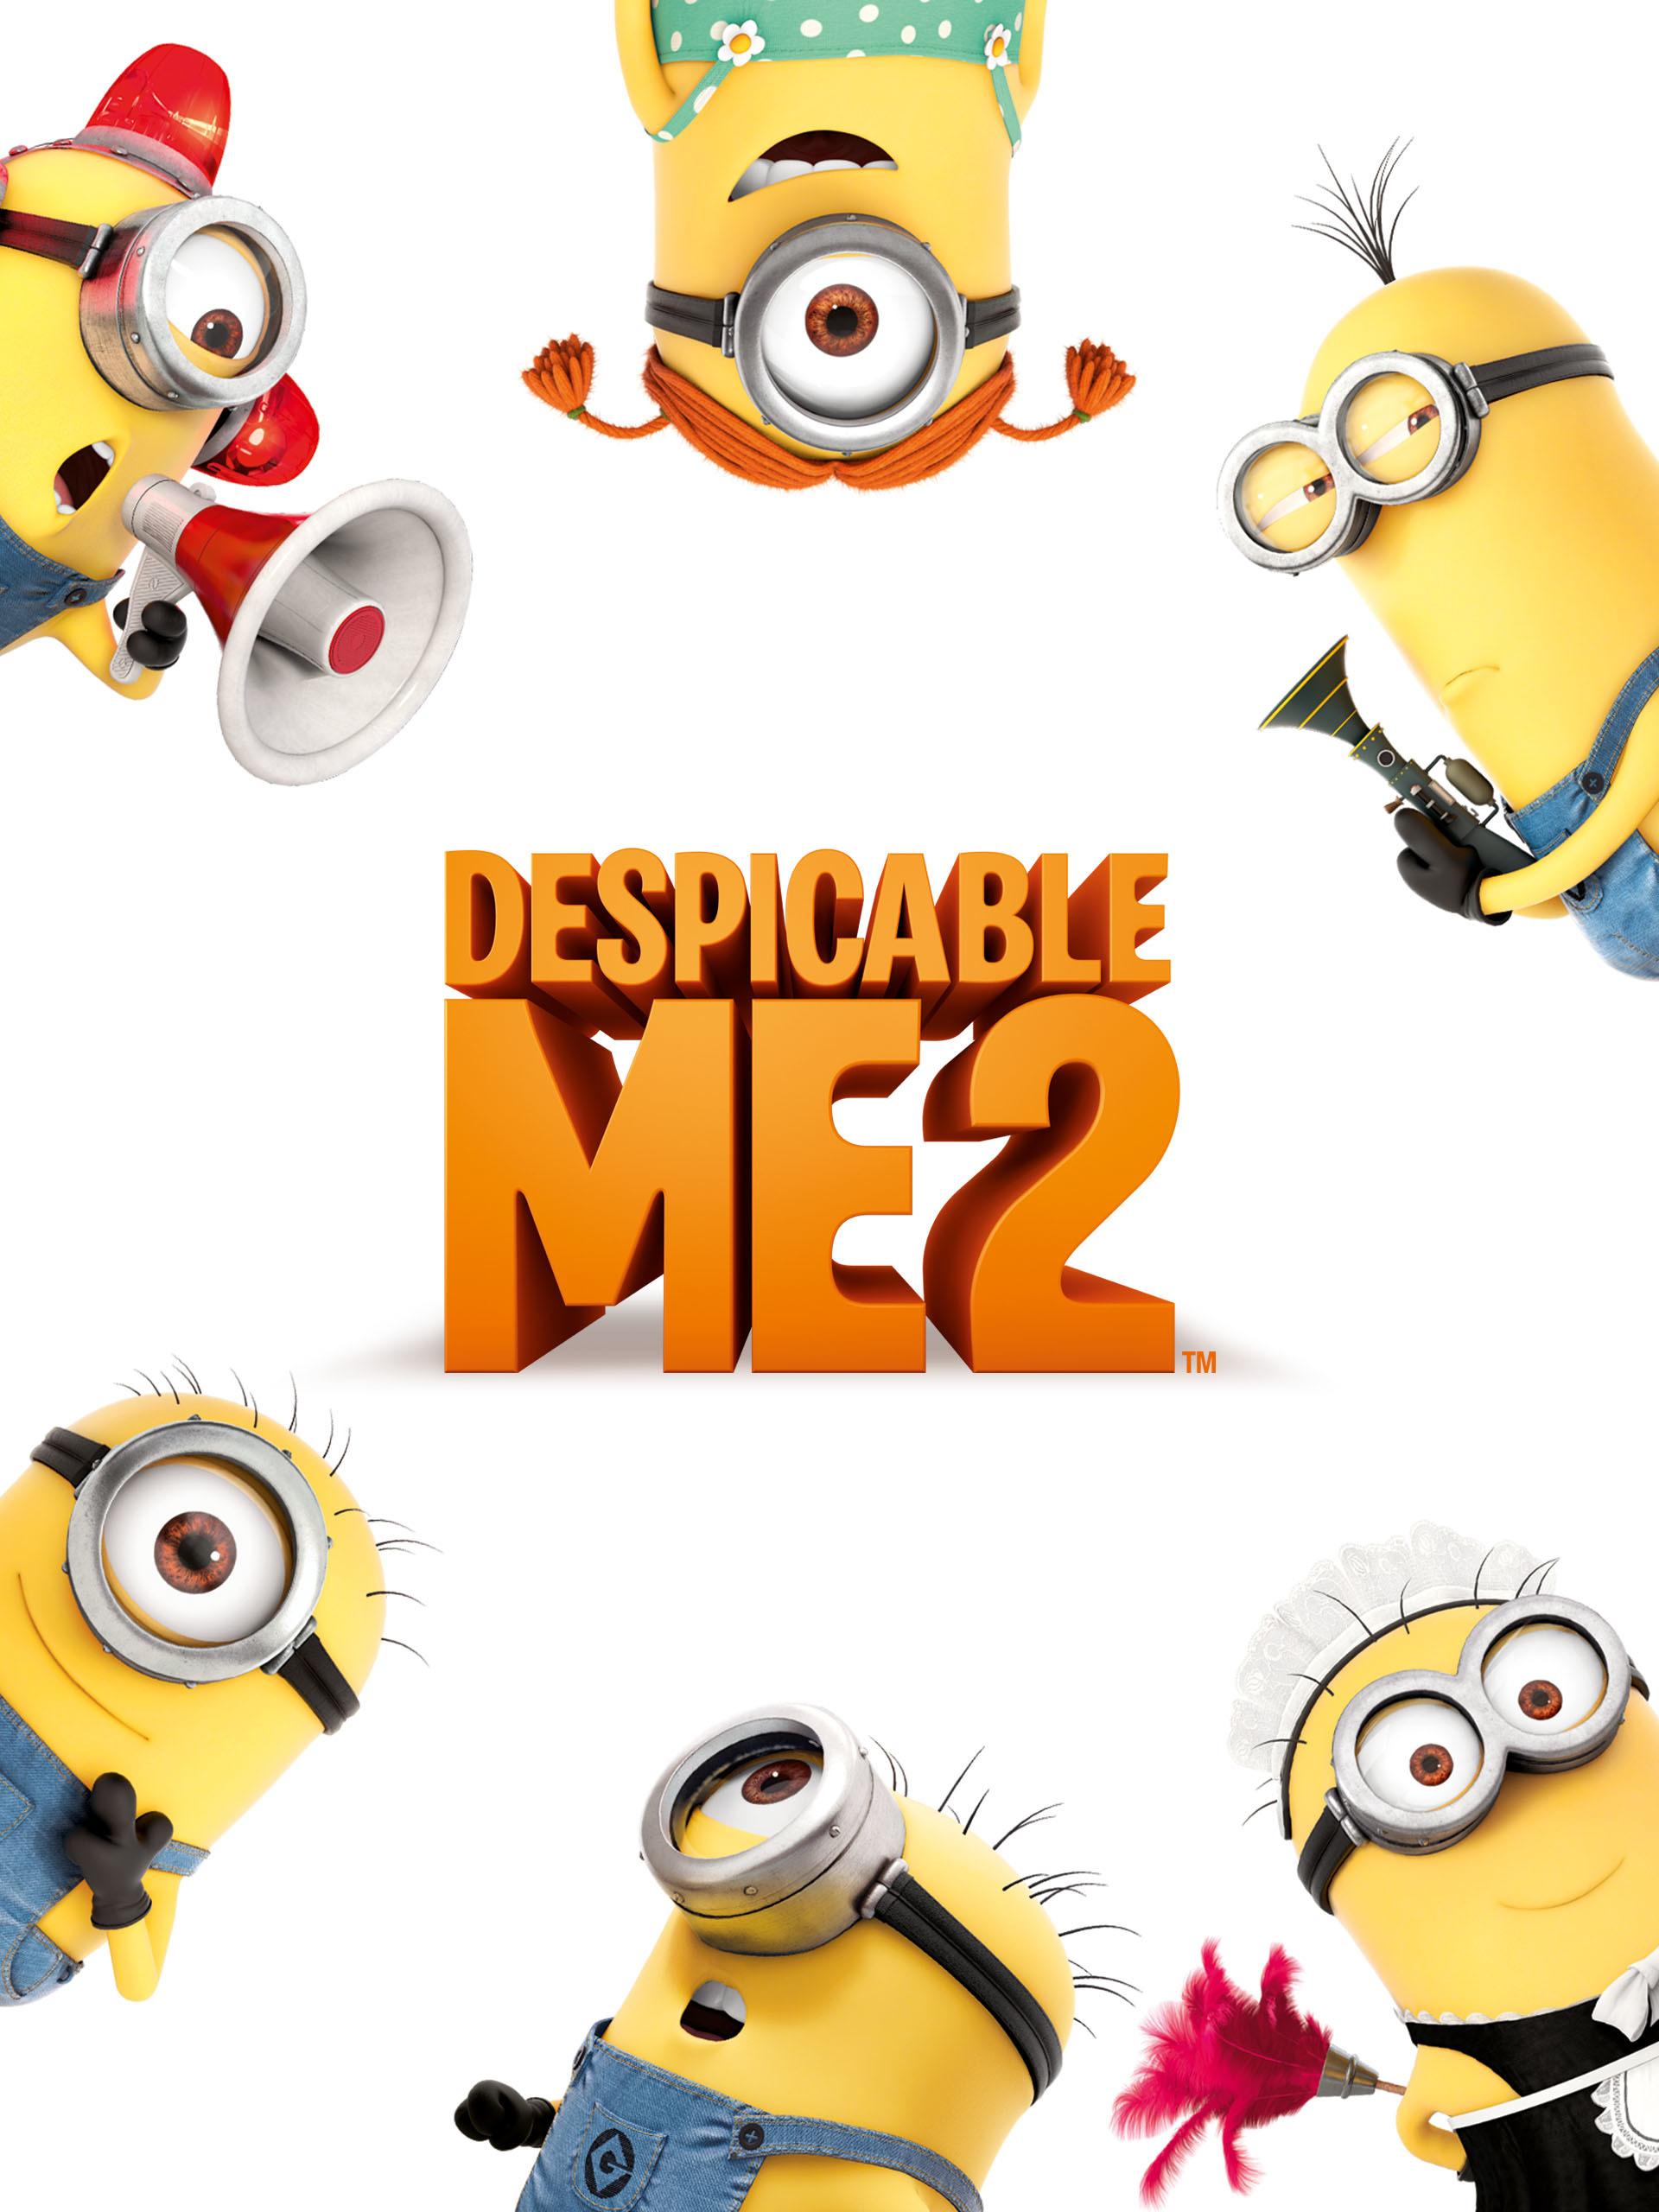 Prime Video: Despicable Me 2